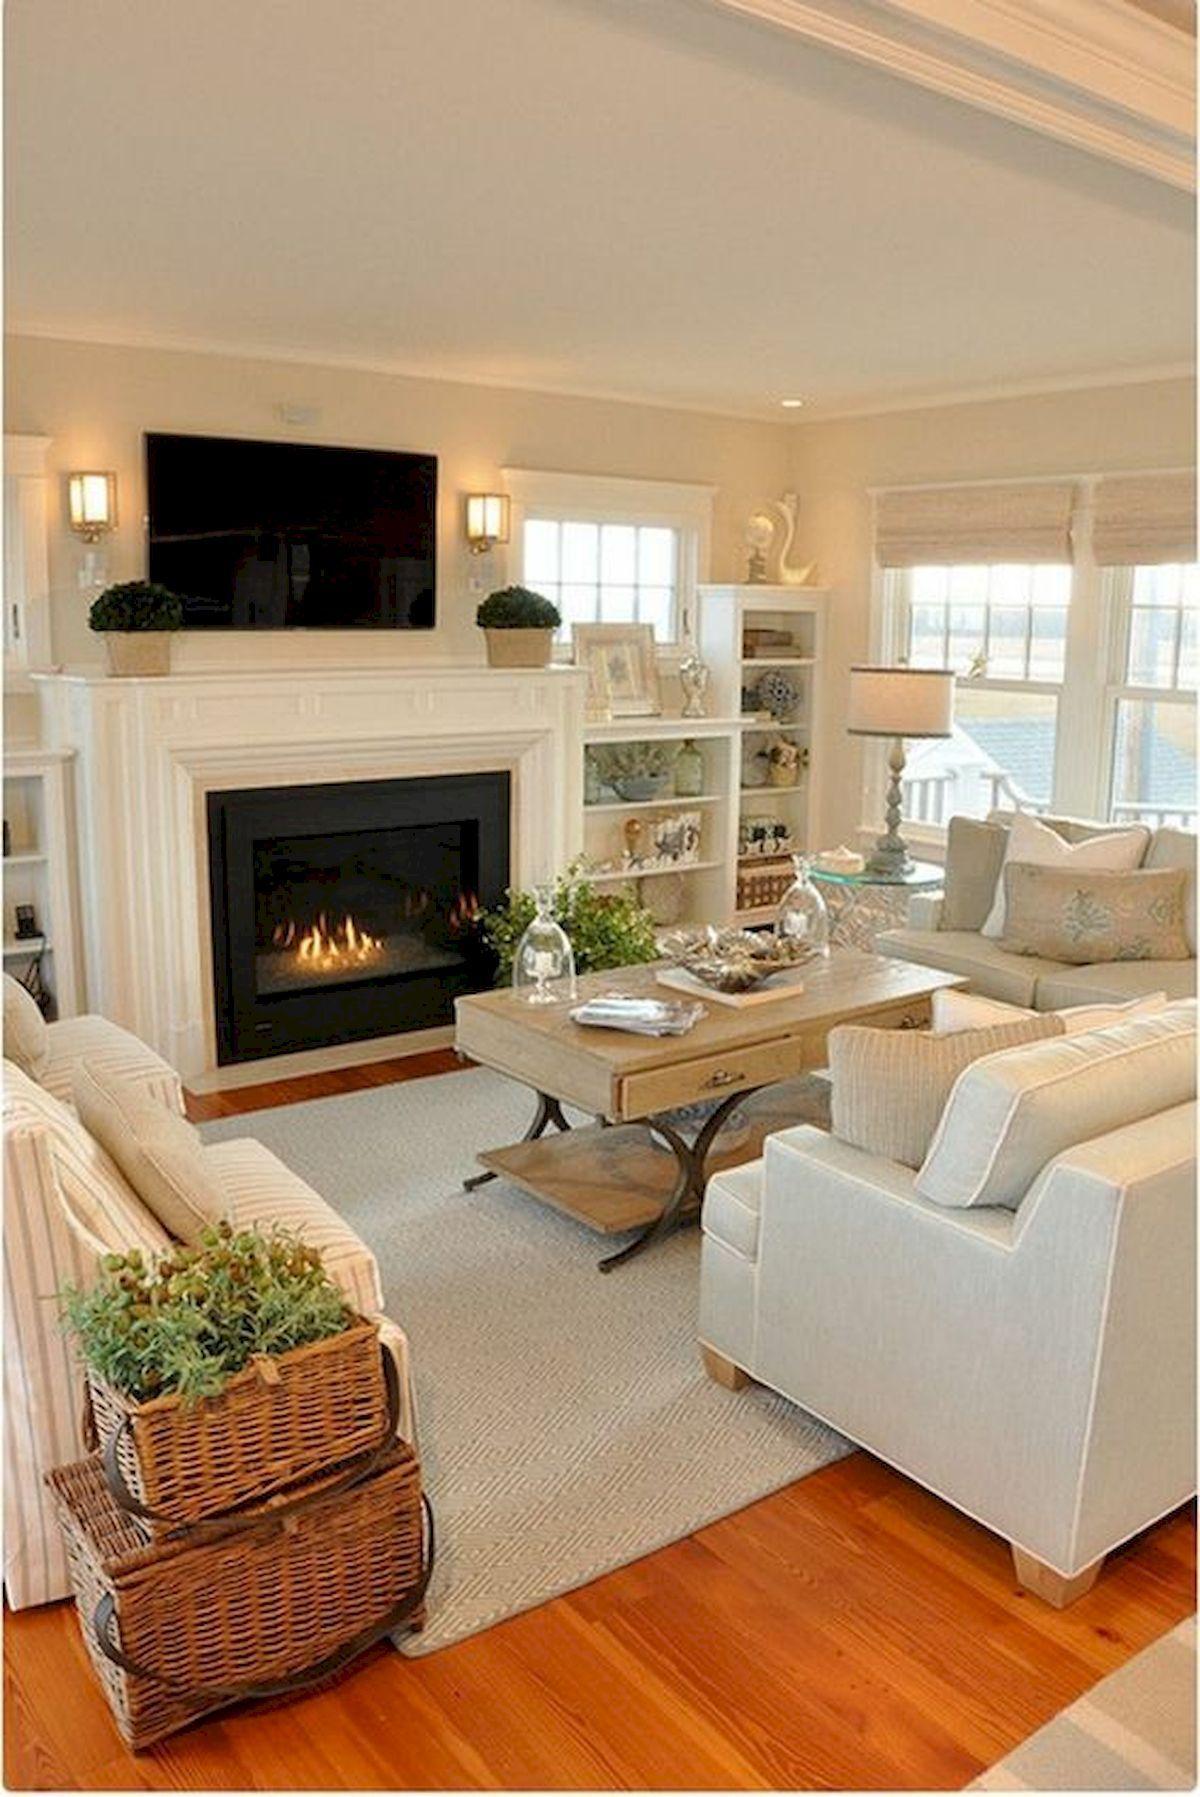 60 Best Living Room Decorating Ideas Designs: 30 Elegant Farmhouse Living Room Decor Ideas